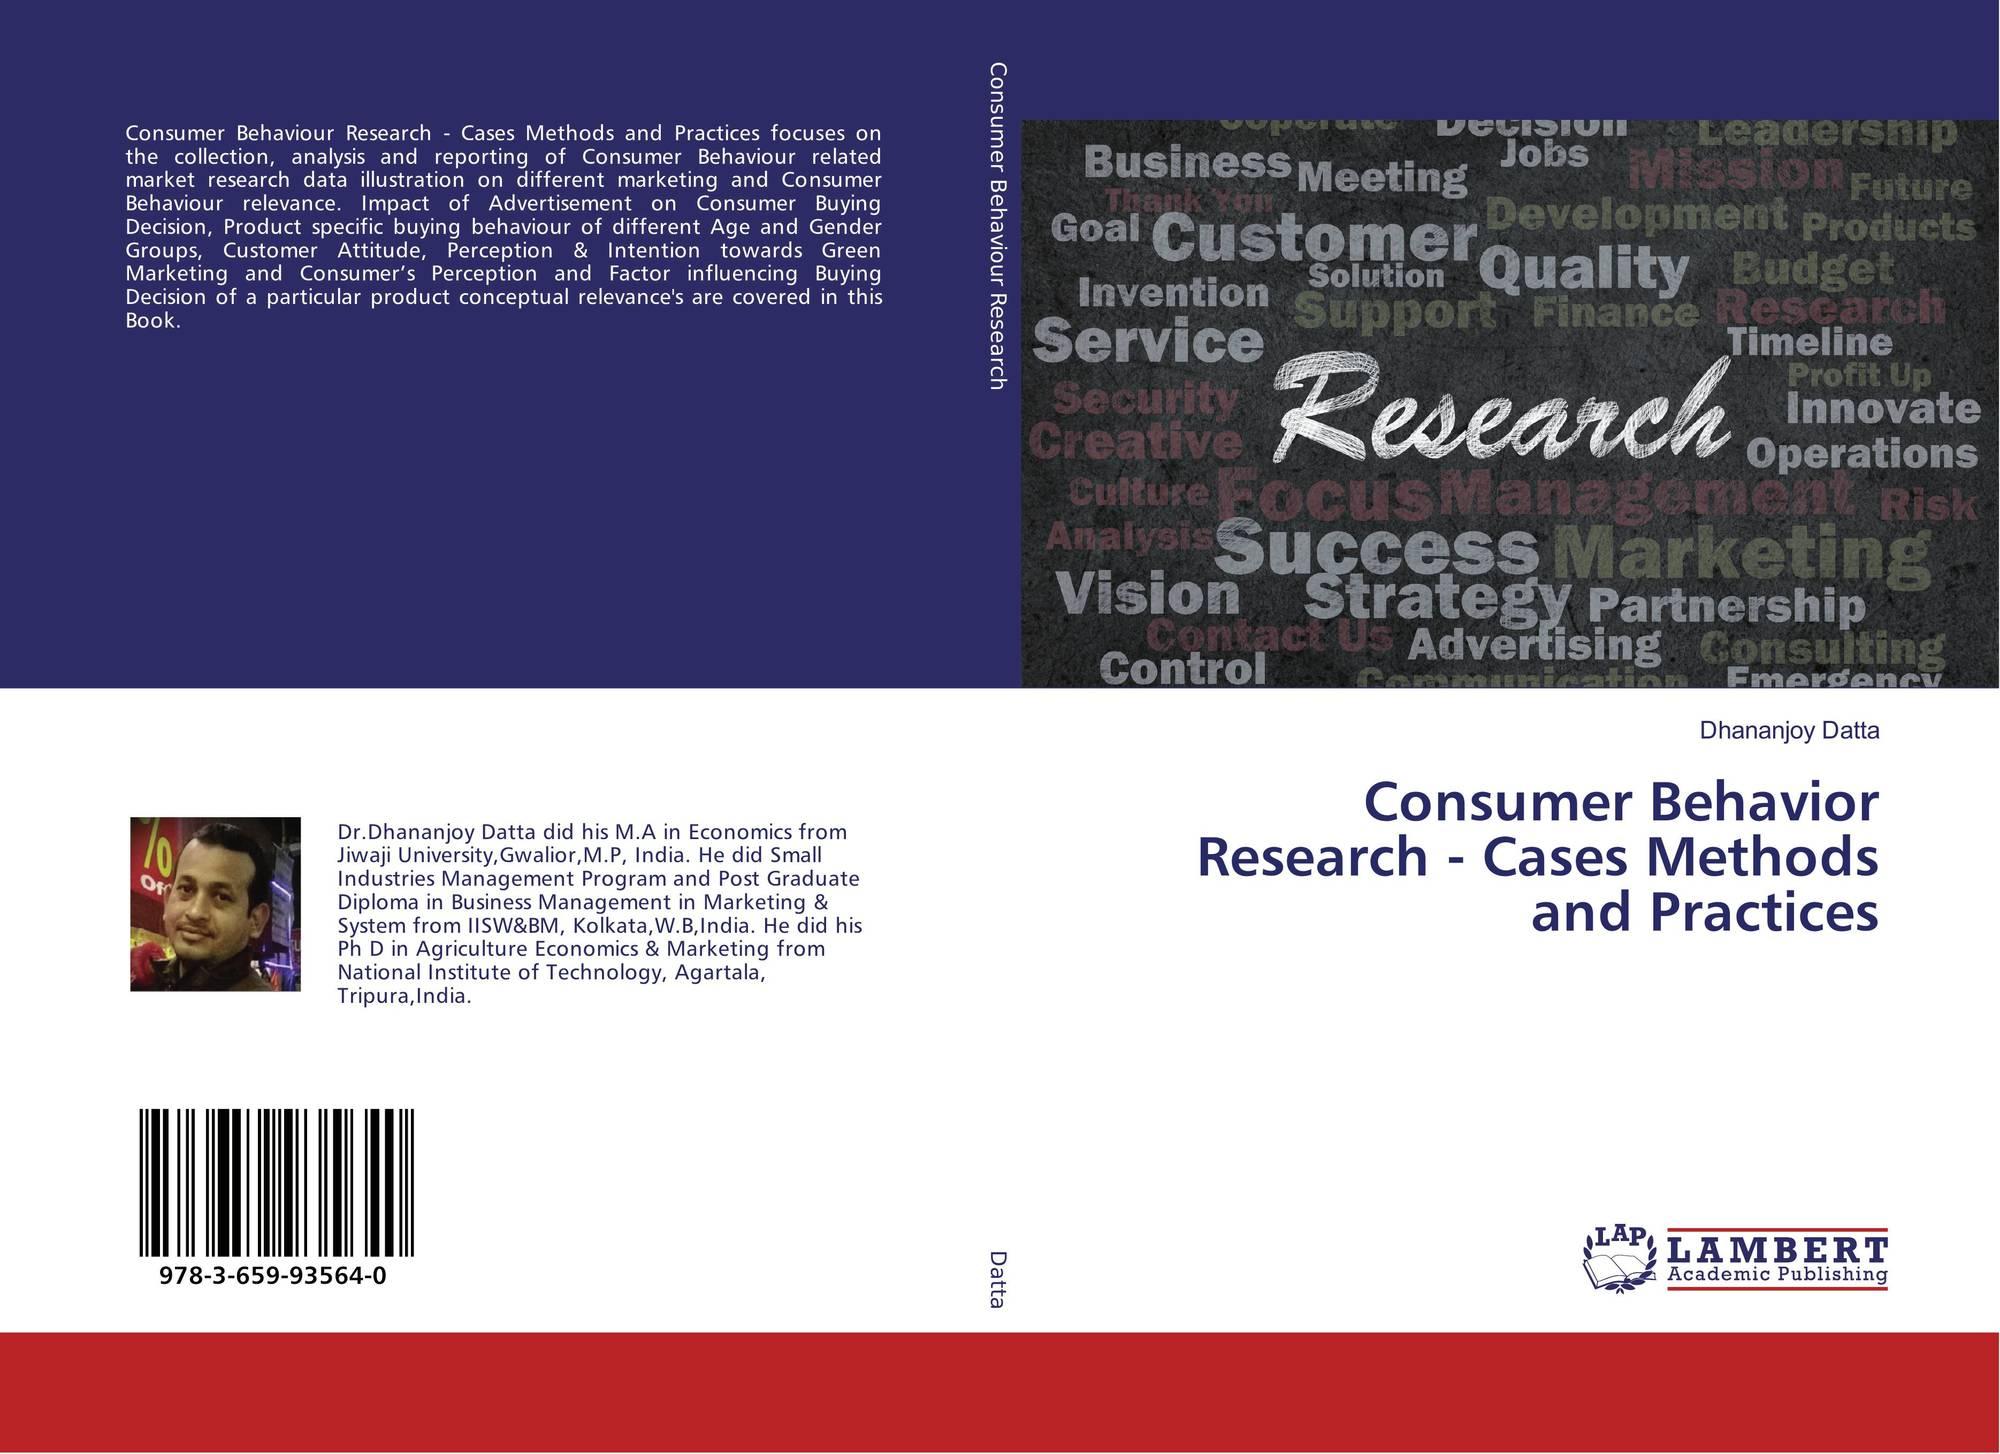 a report of consumer behavior